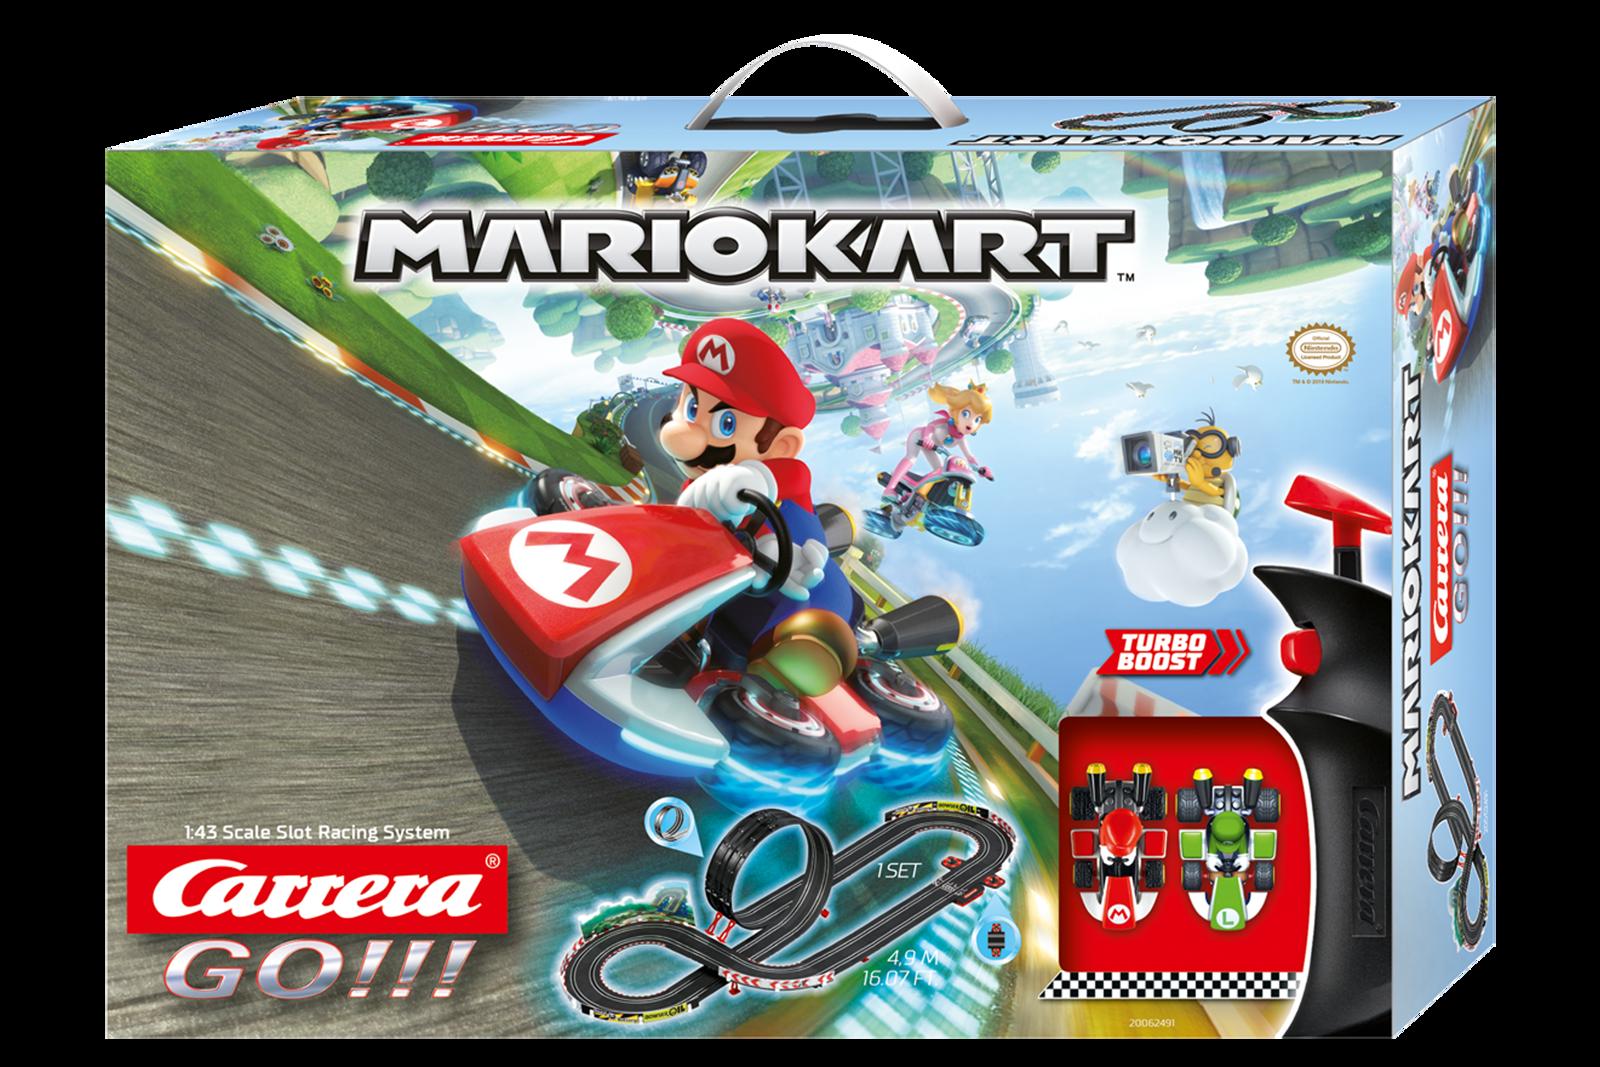 62491 Go!!! Nintendo Mario Kart 8, Carrera